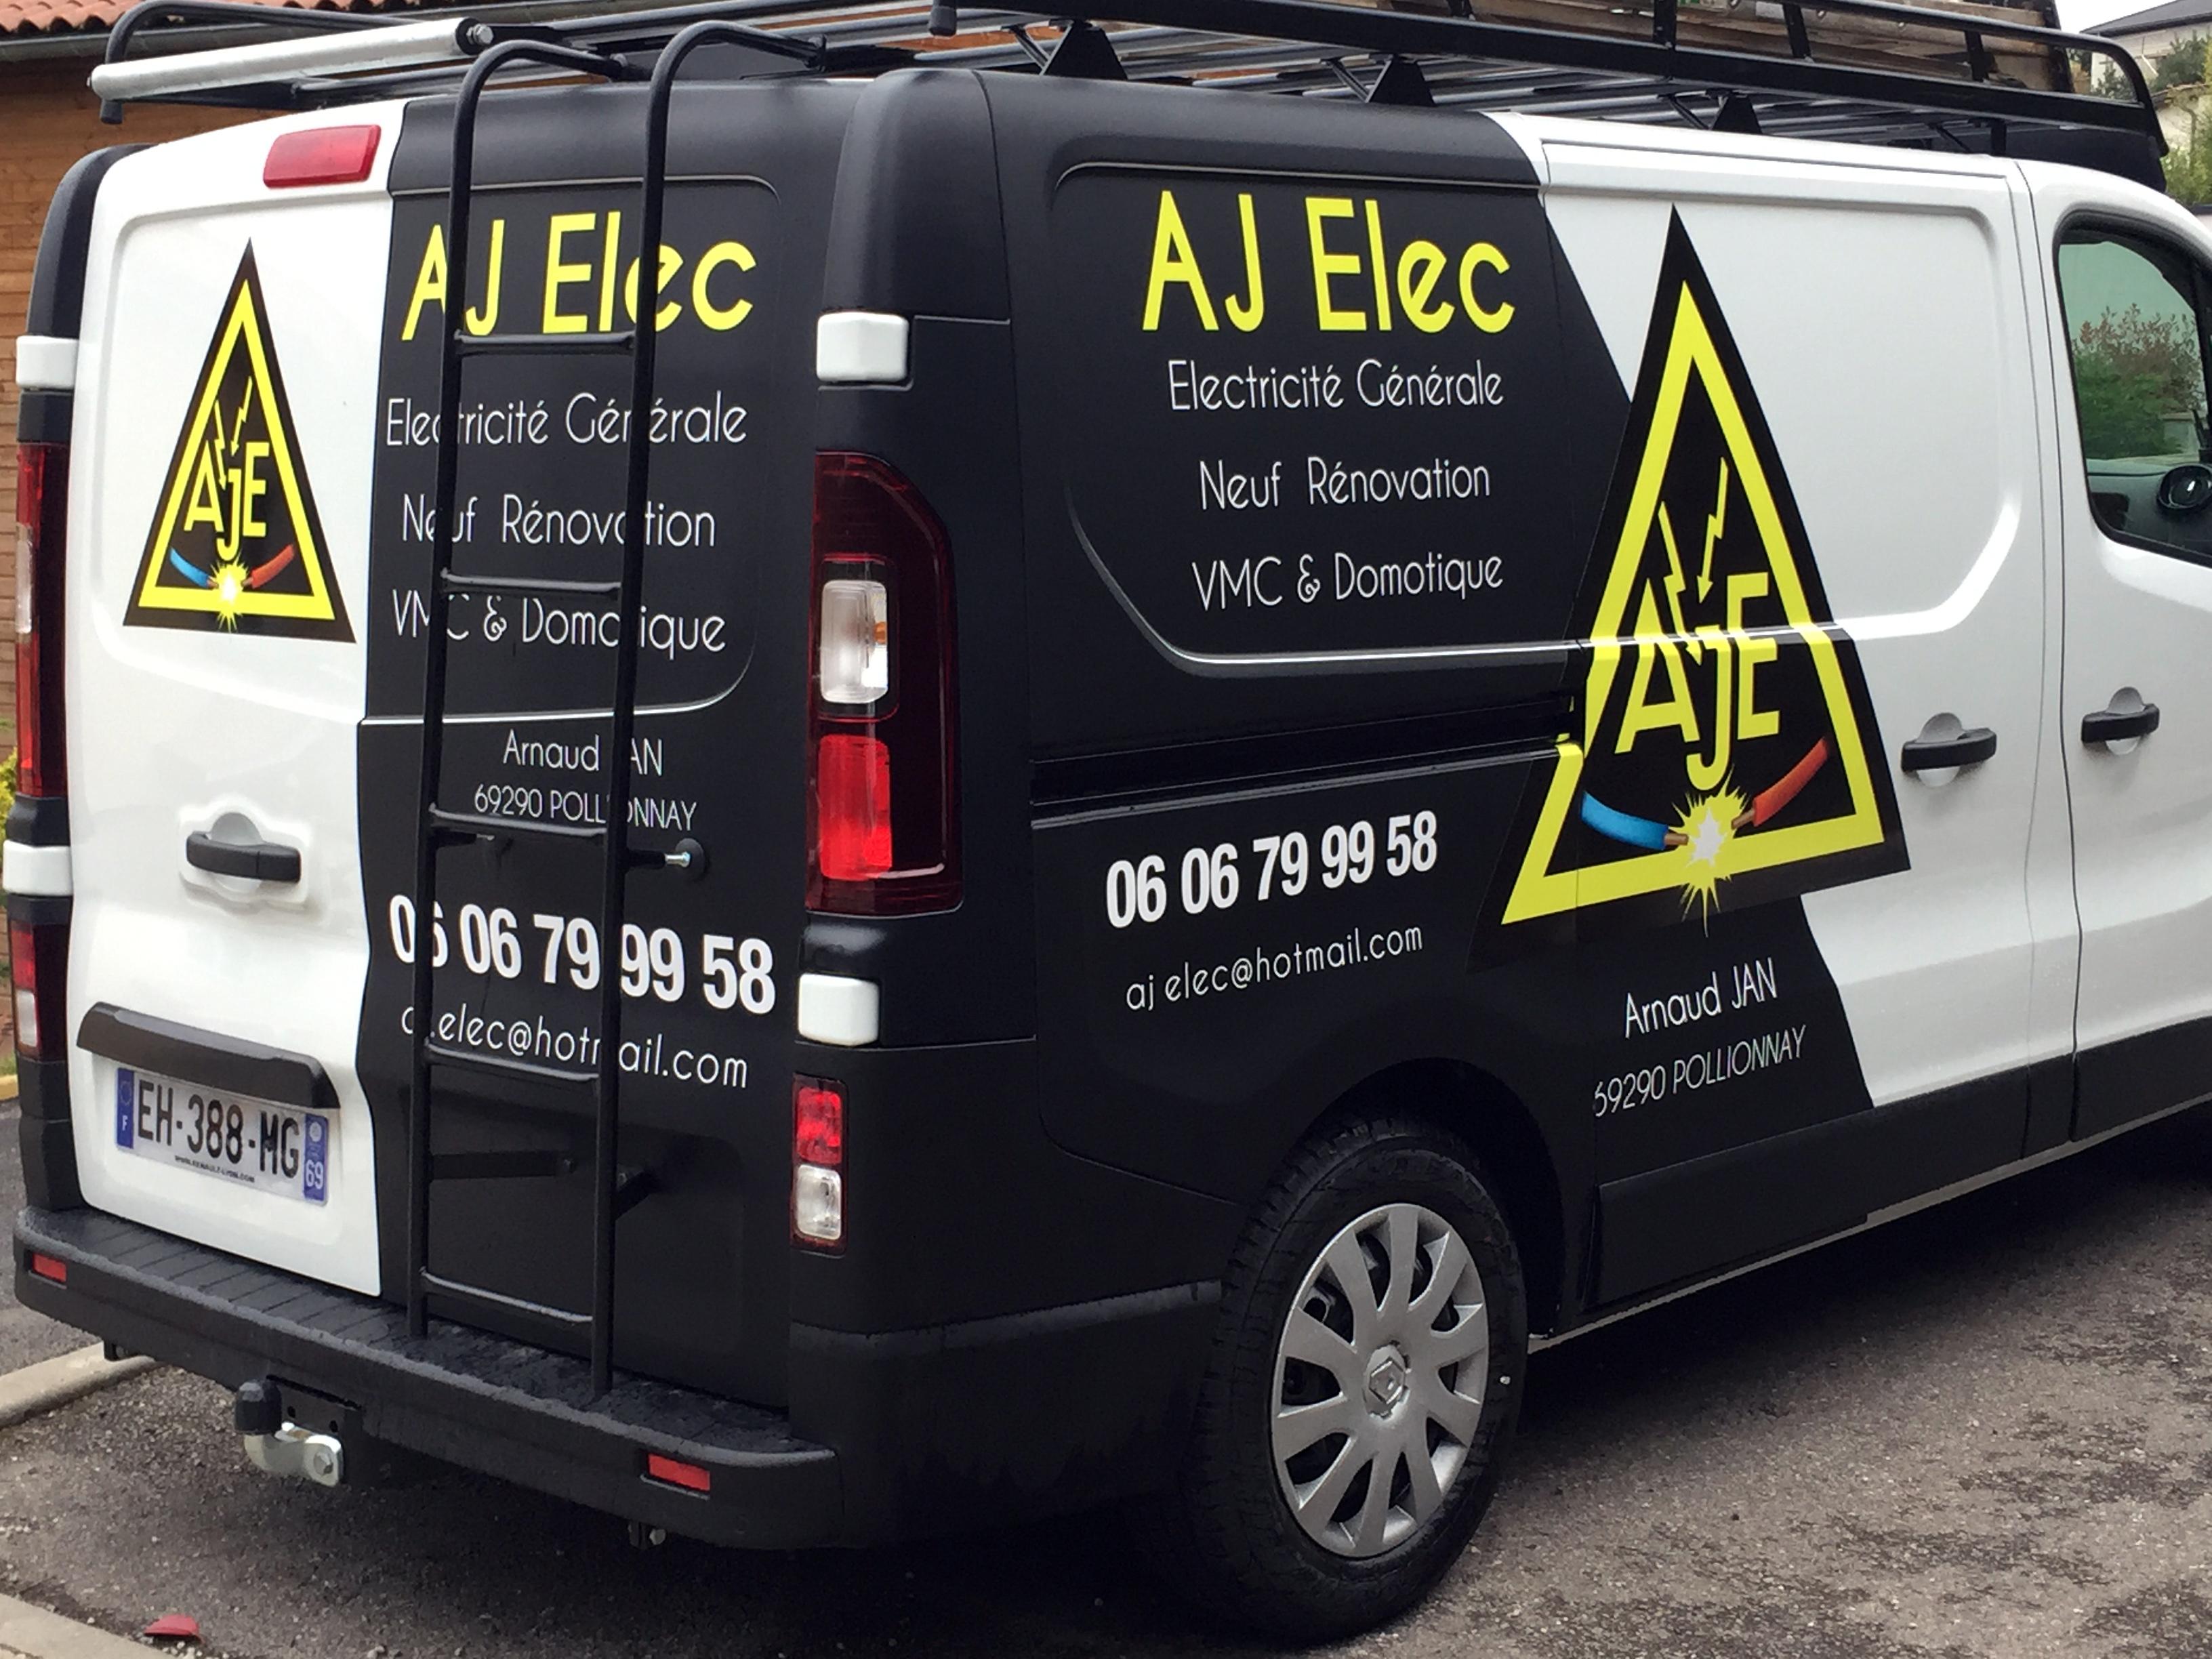 semi-covering-publicite-vehicule-aj-elec-magnetik-communication (3)